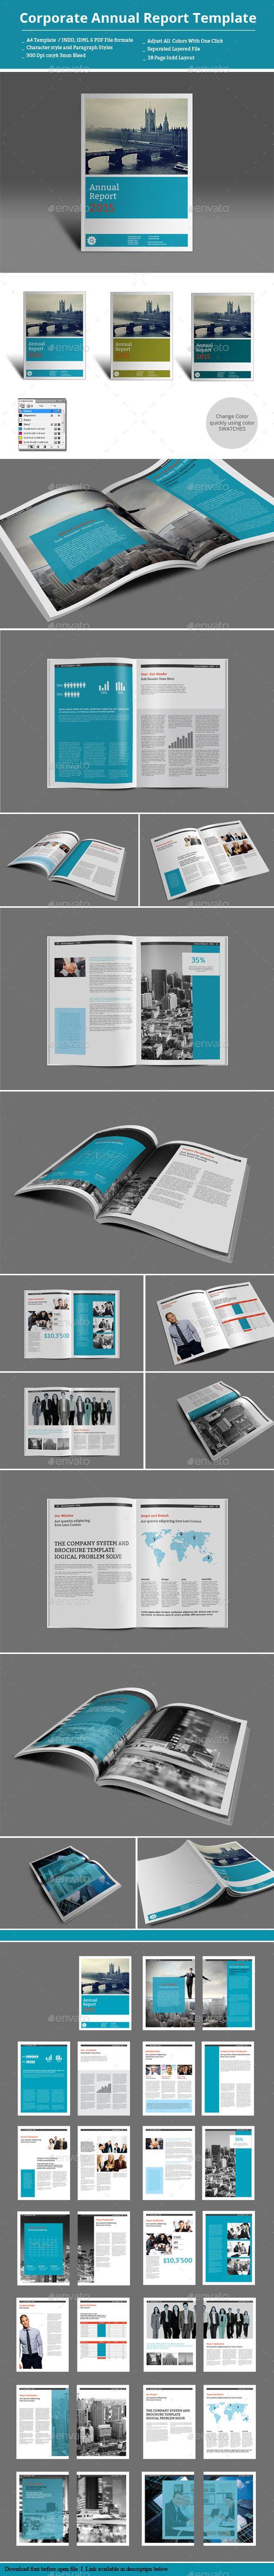 Corporate Annual Report Template | Informes anuales, Folletos y Plantas